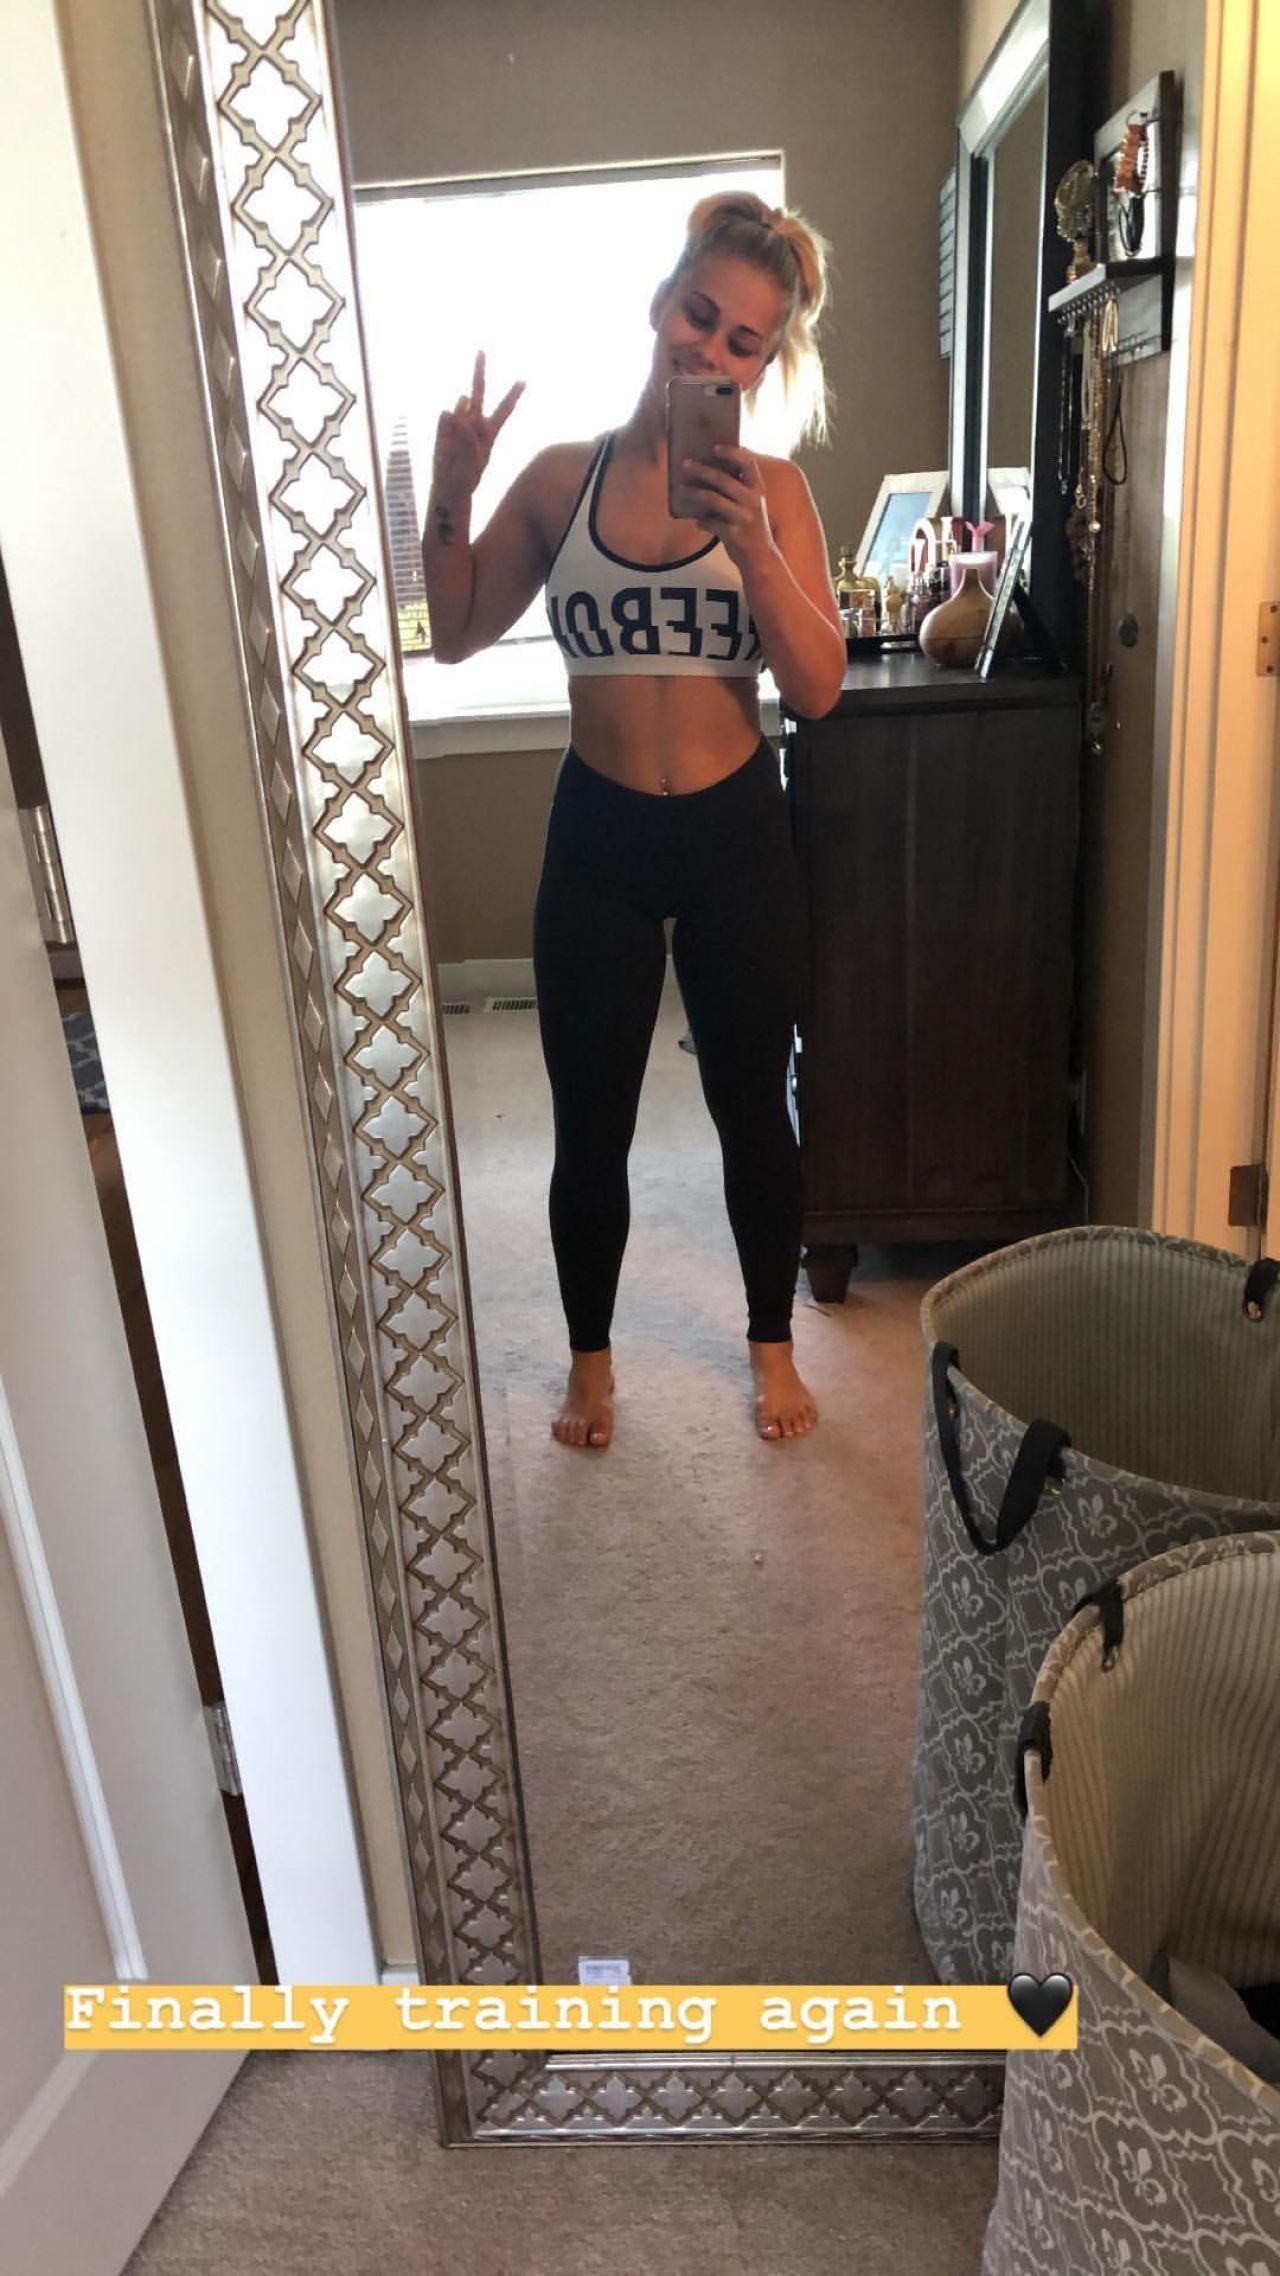 Paige vanzant in a bikini for yoga 7 - 2019 year